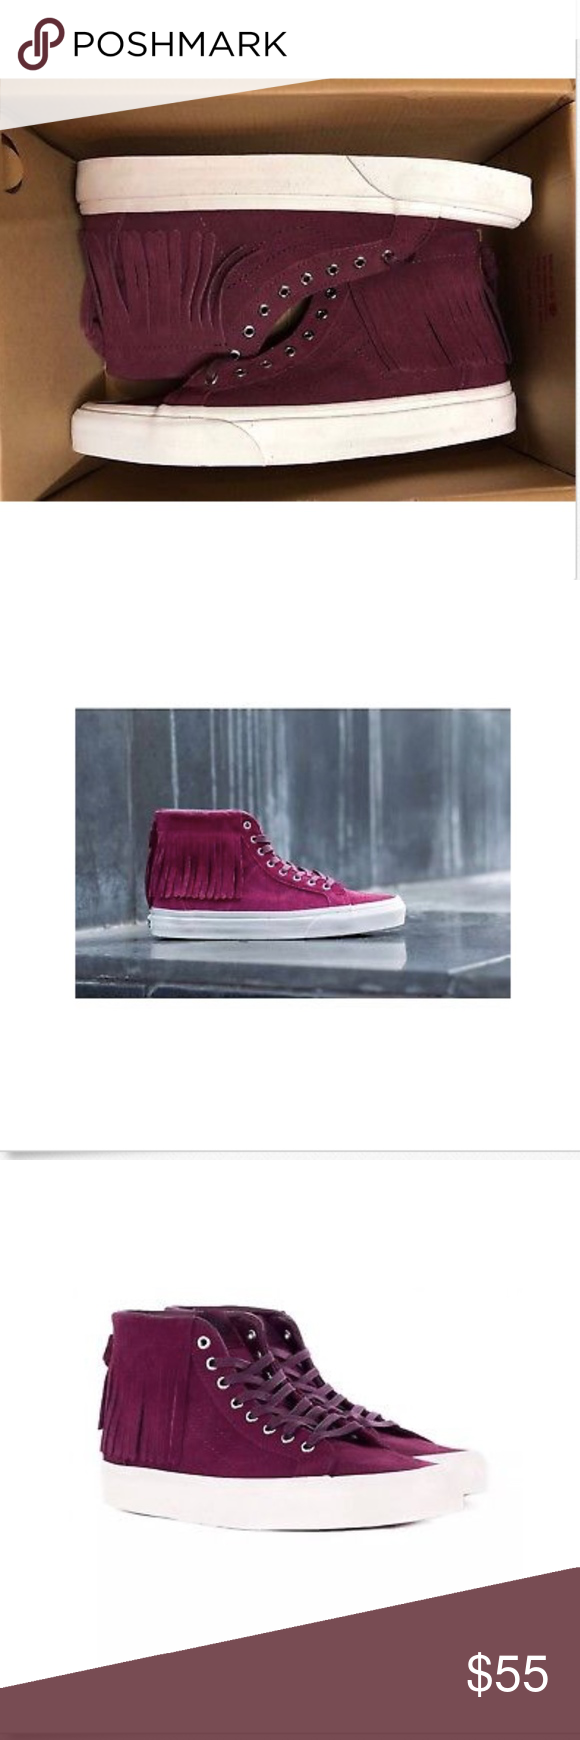 8fed66d07f Vans Sk8 Hi Moc Suede Port Royale Blanc Shoes🌹 Vans Sk8 Hi Moc Suede Port  Royale Blanc Shoes Size Men 8.5 Women 10 Brand New In Box Vans Shoes  Athletic ...